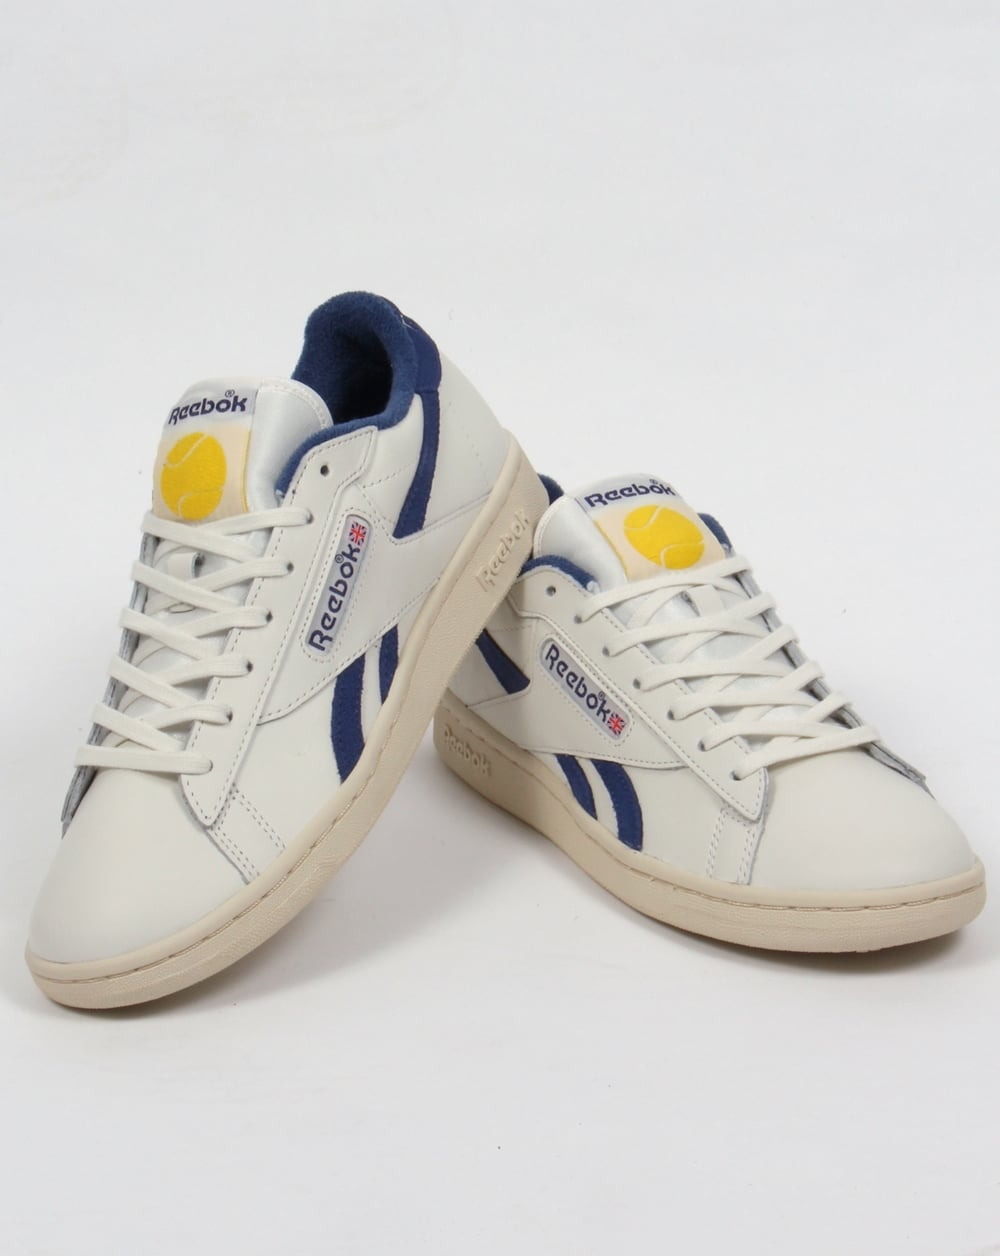 Buy reebok blue trainers   OFF43% Discounted b0beea973